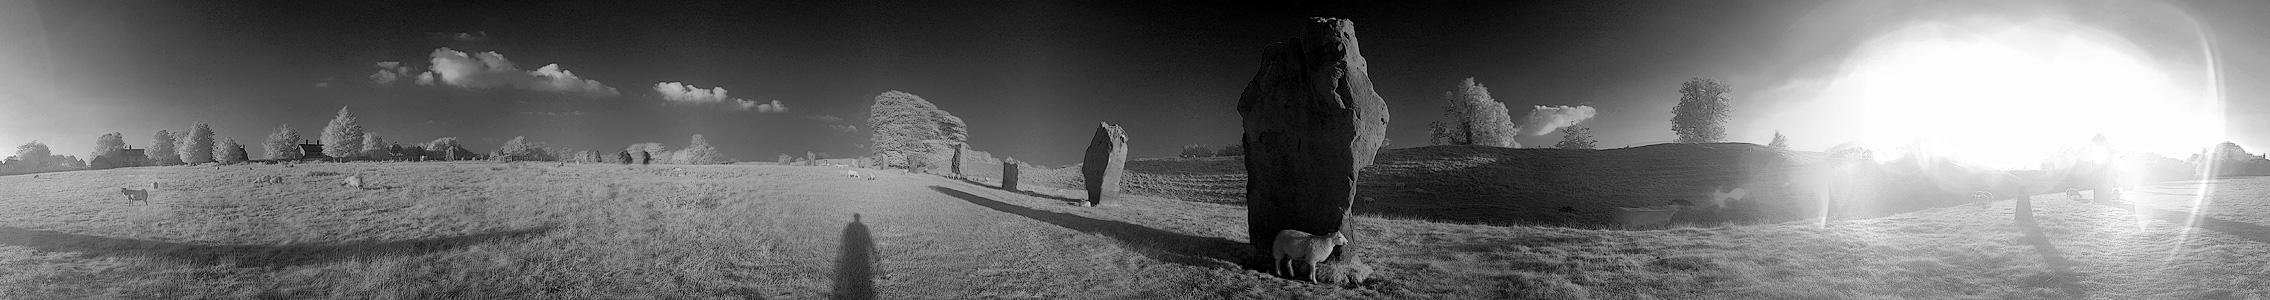 360° Panorama: Avebury Stonecircle in S/W-Infrarot am späten Abend